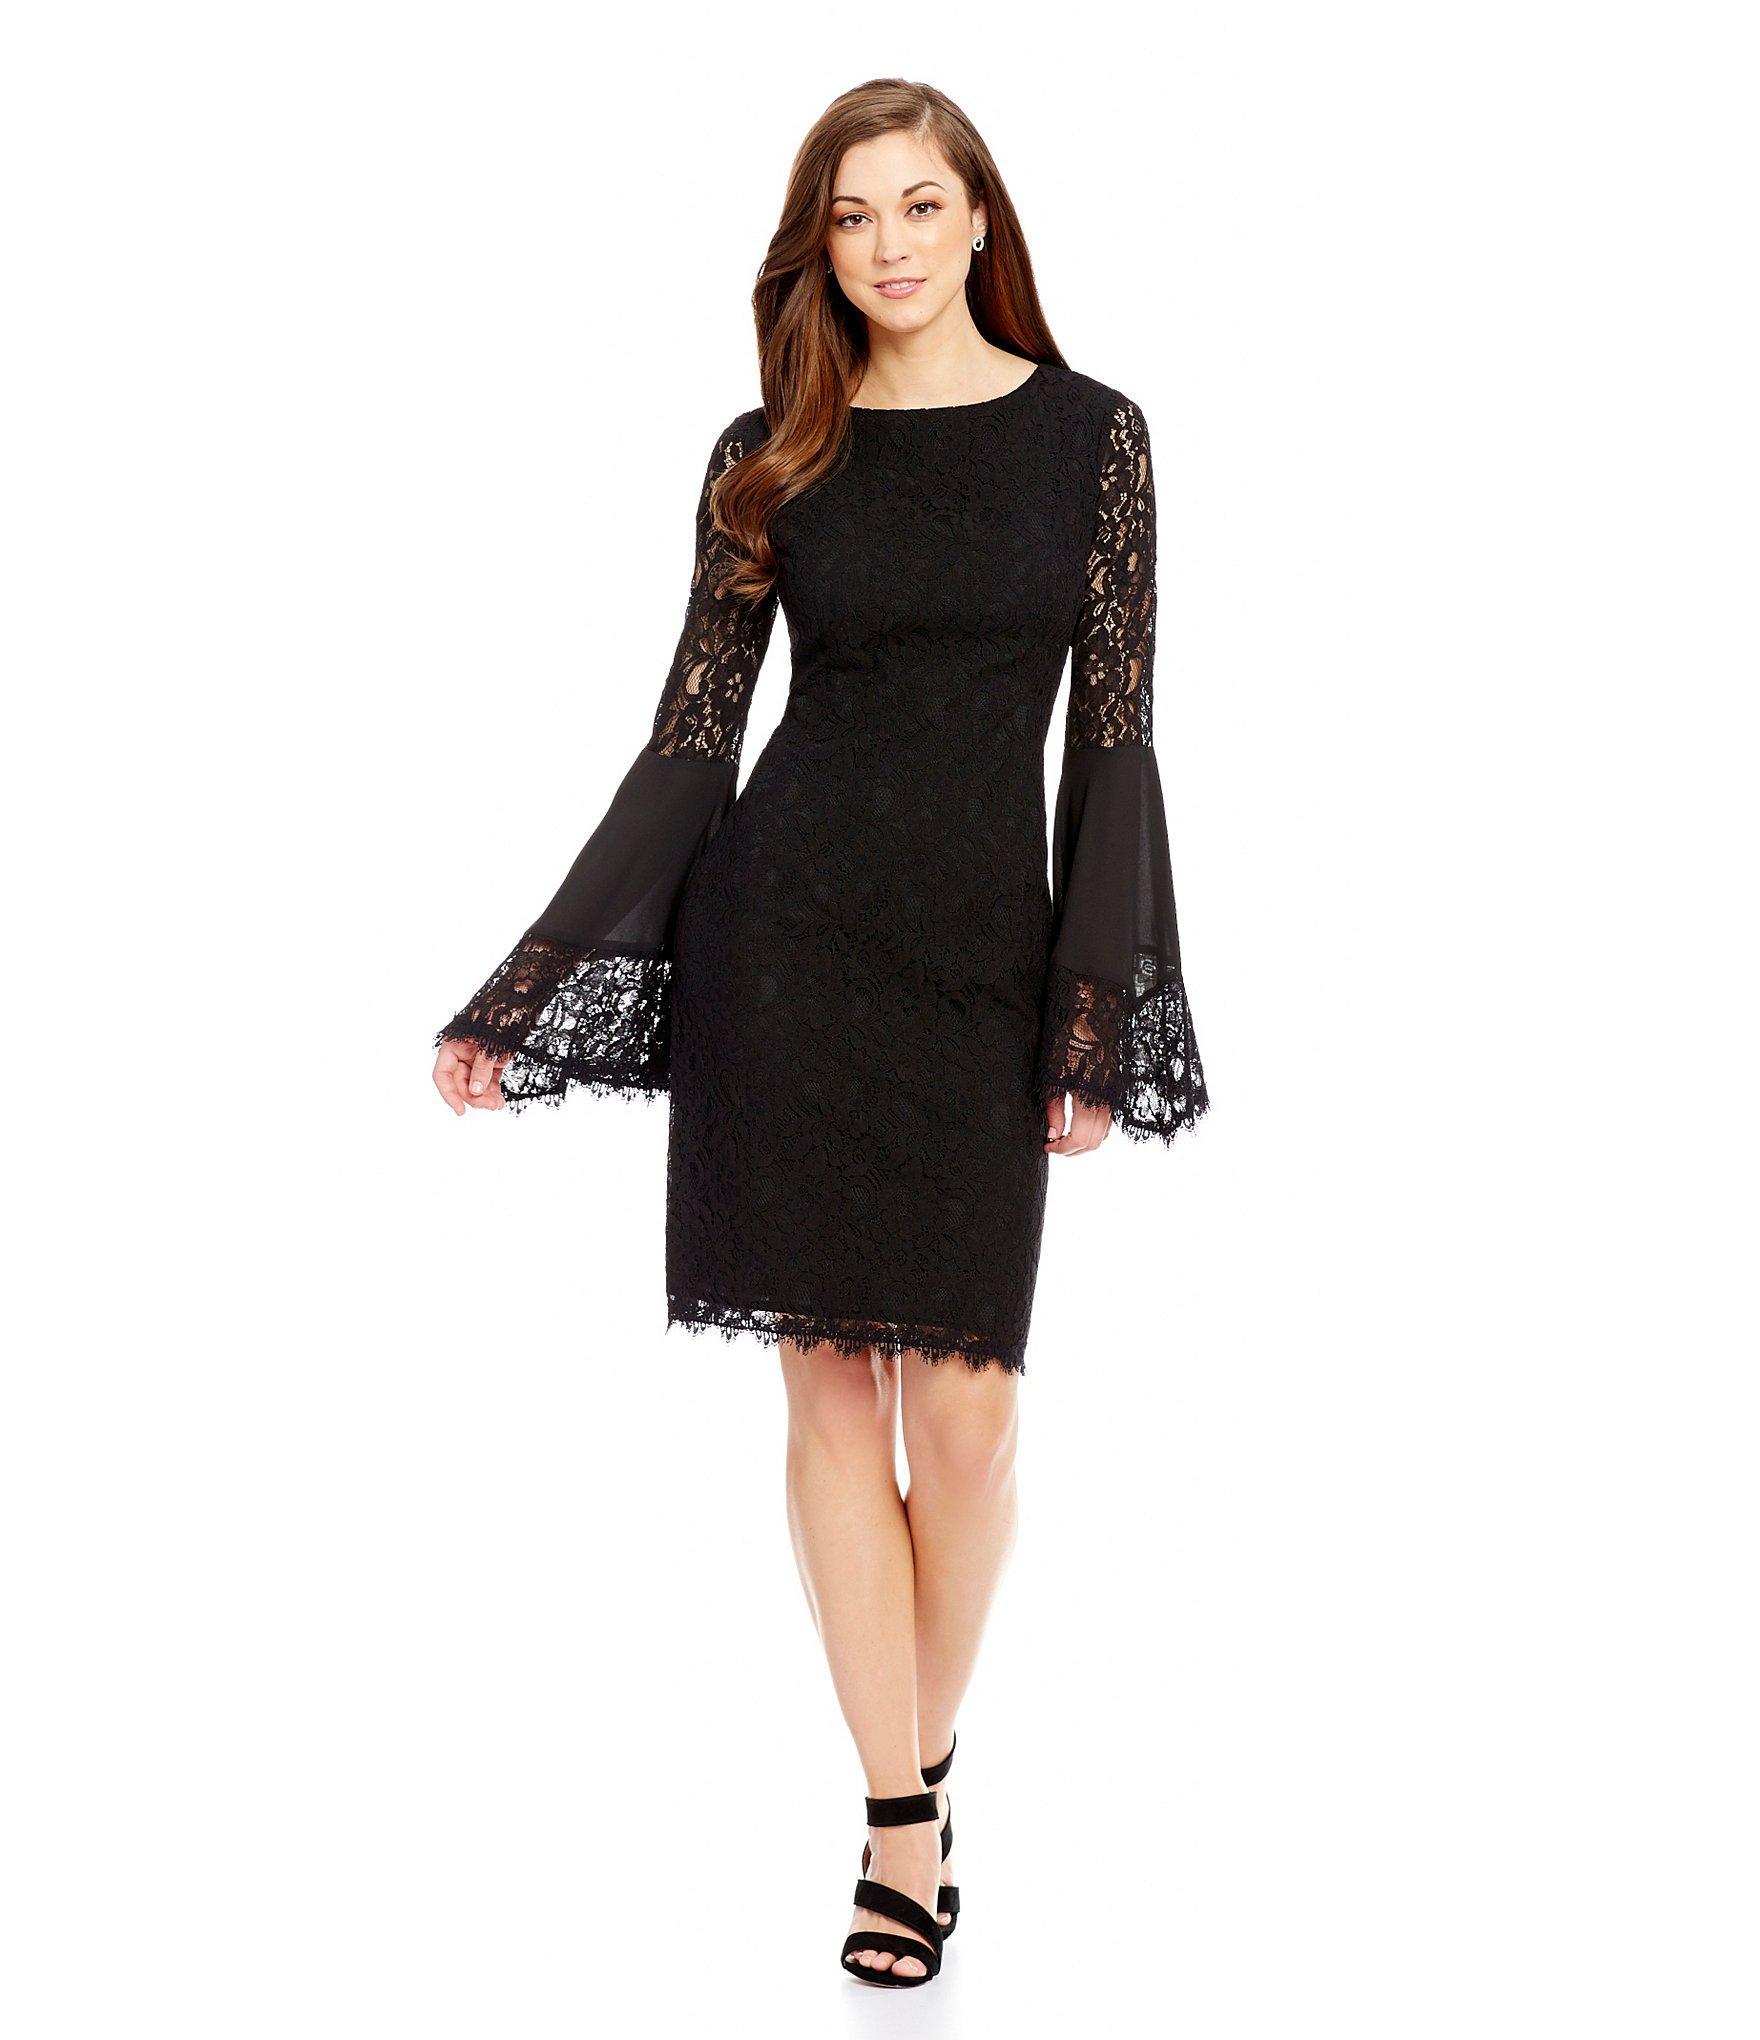 Yoana baraschi celestial garden lace dress nordstrom rack - Gallery